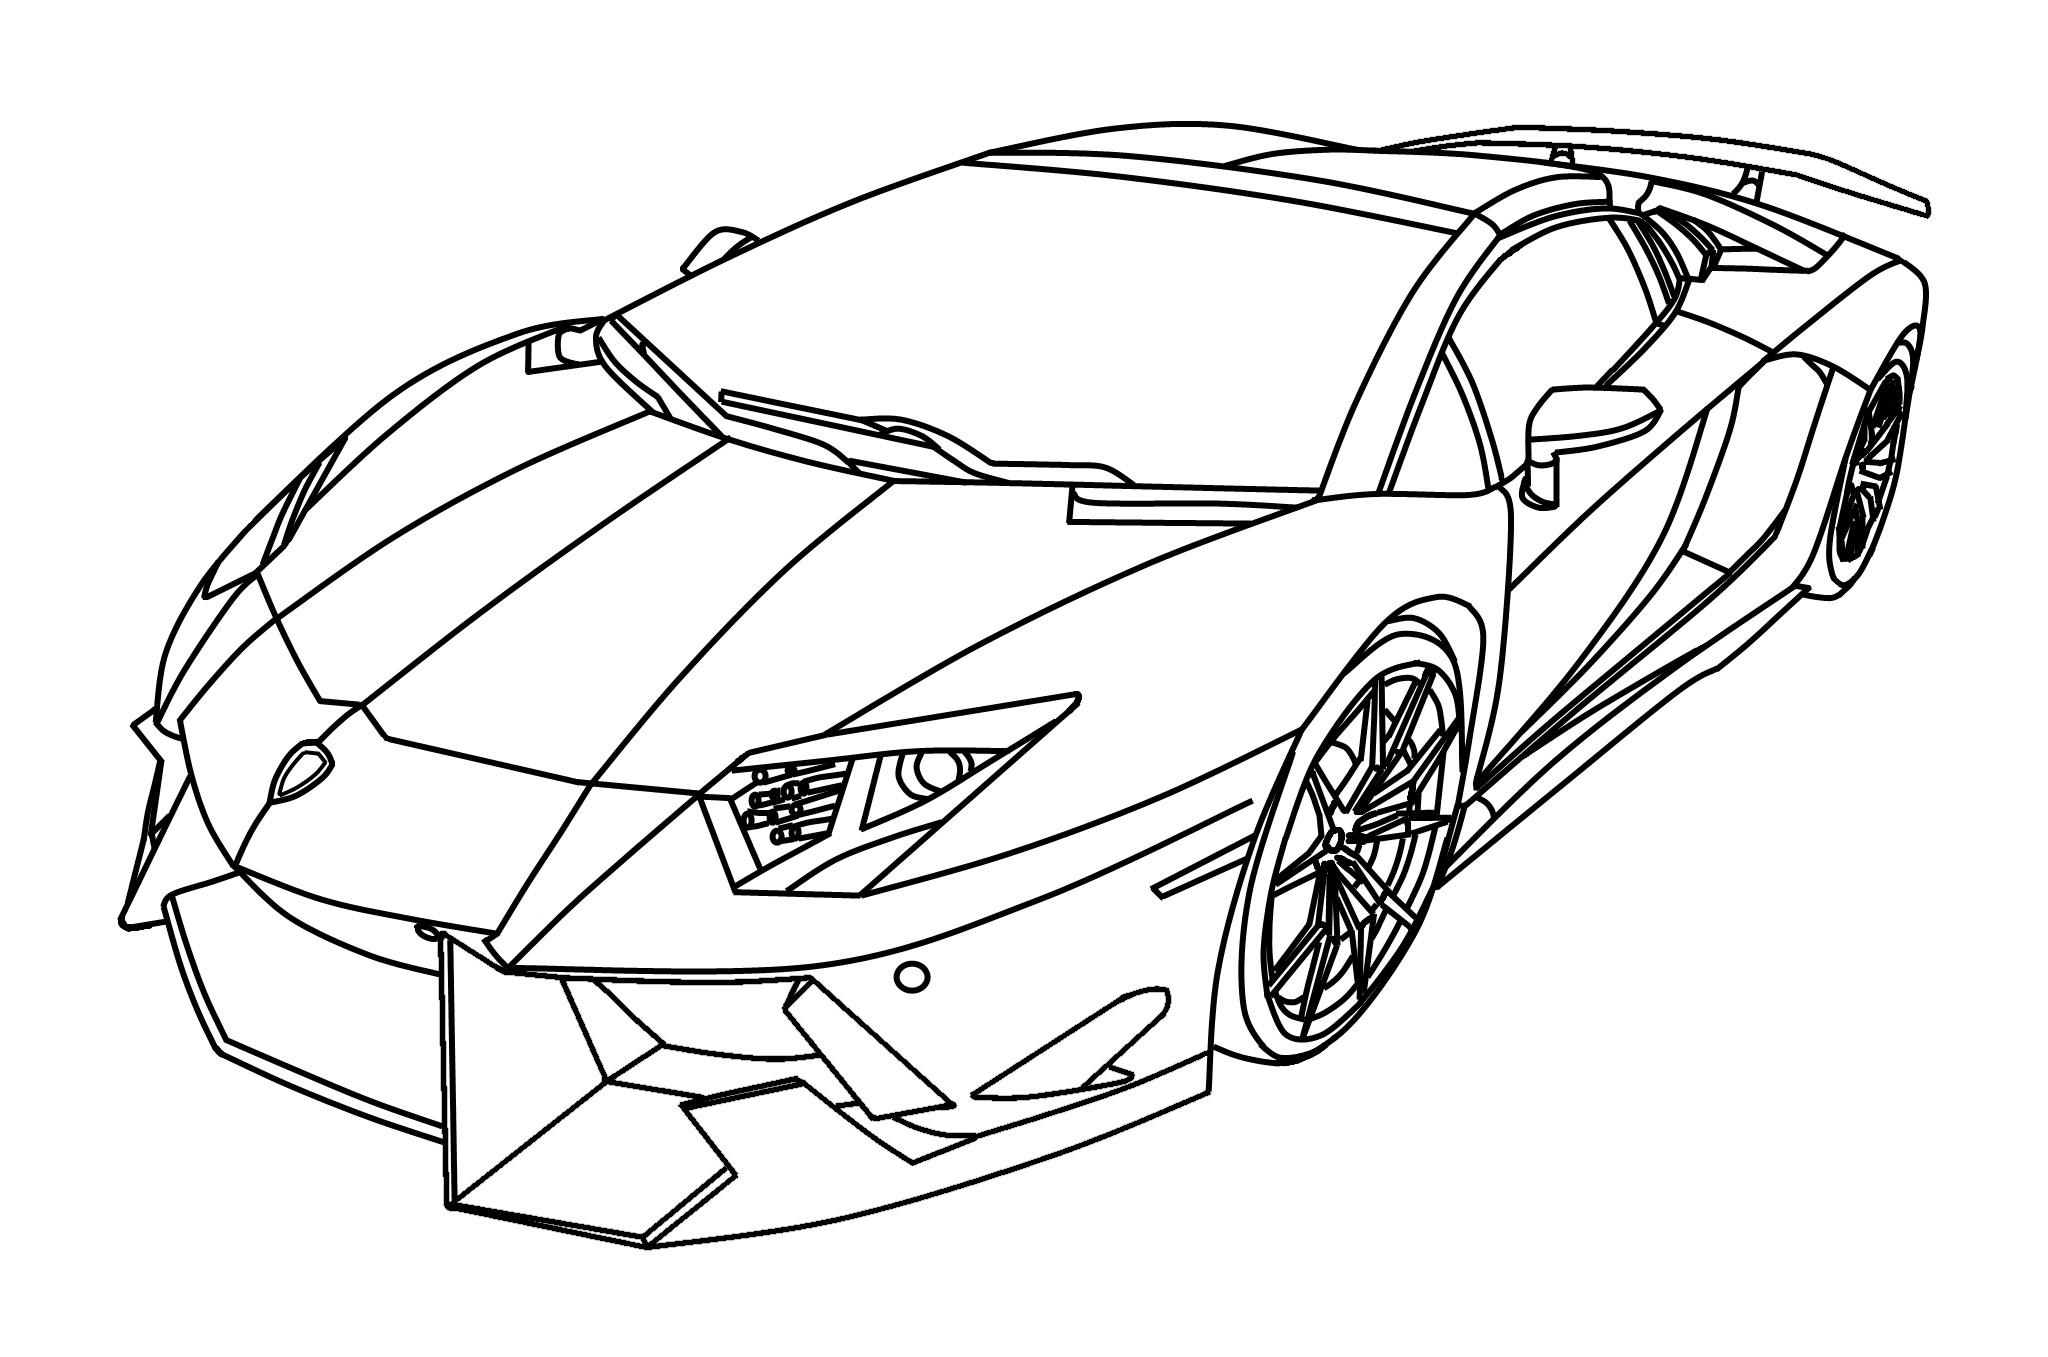 Drawn lamborghini Pictures Outline Aventador drawing Lamborghini